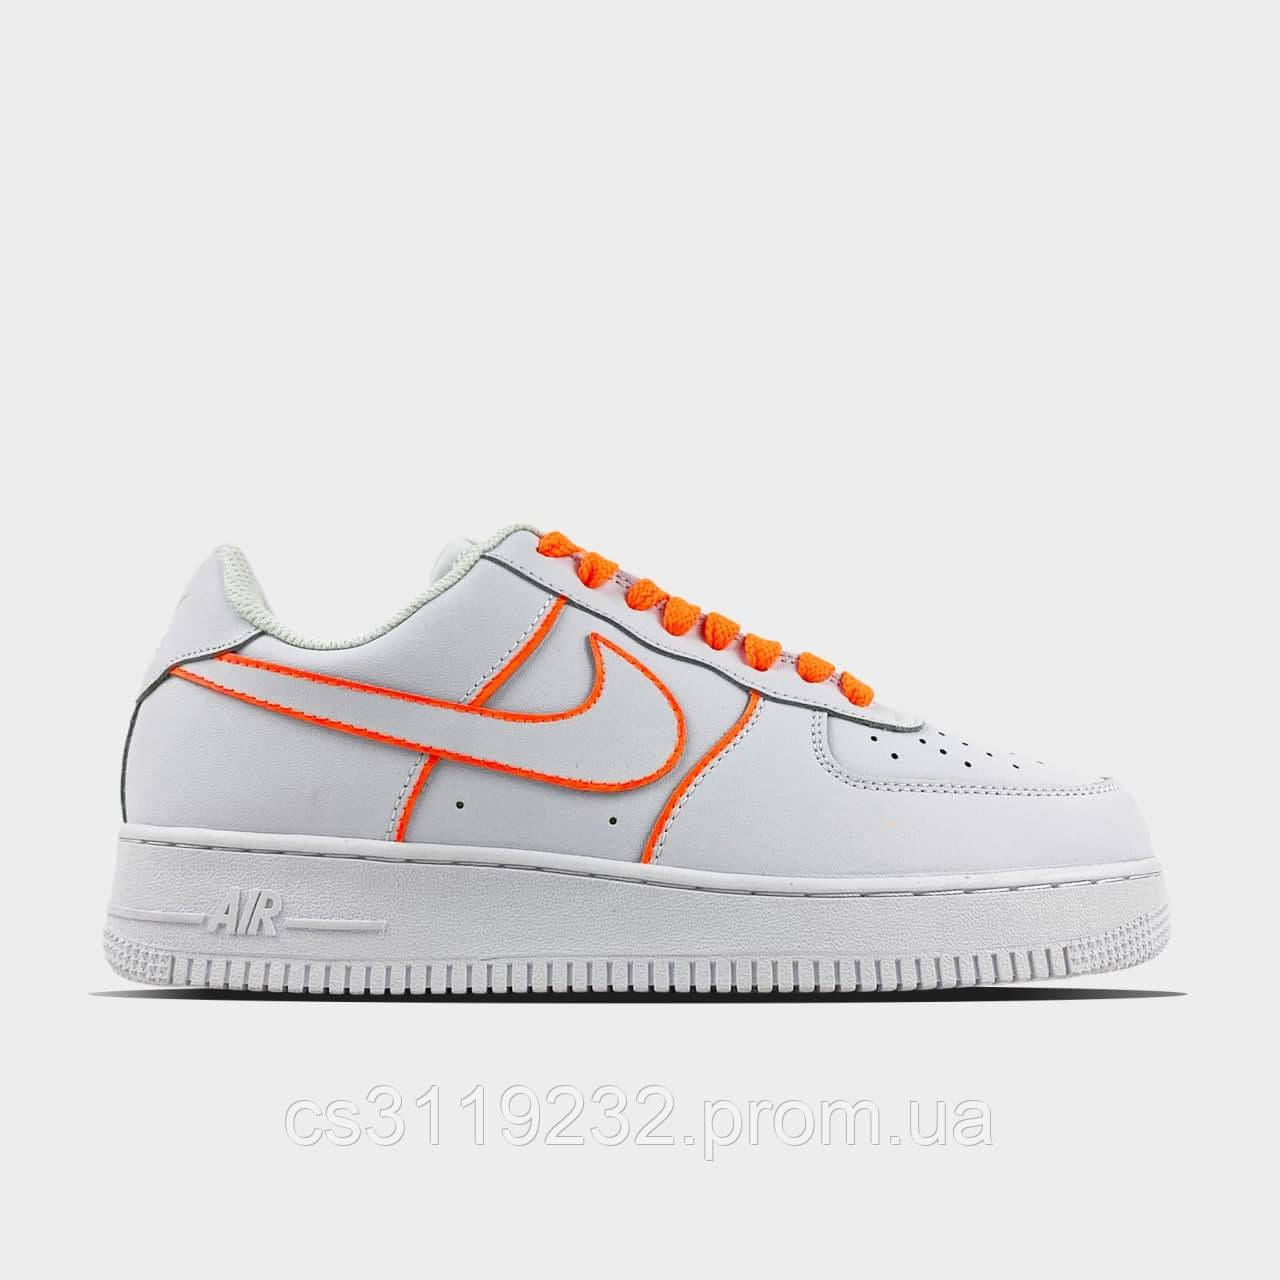 Мужские кроссовки Nike Nike Air Force 1 Low White (белые) 40-45 р.